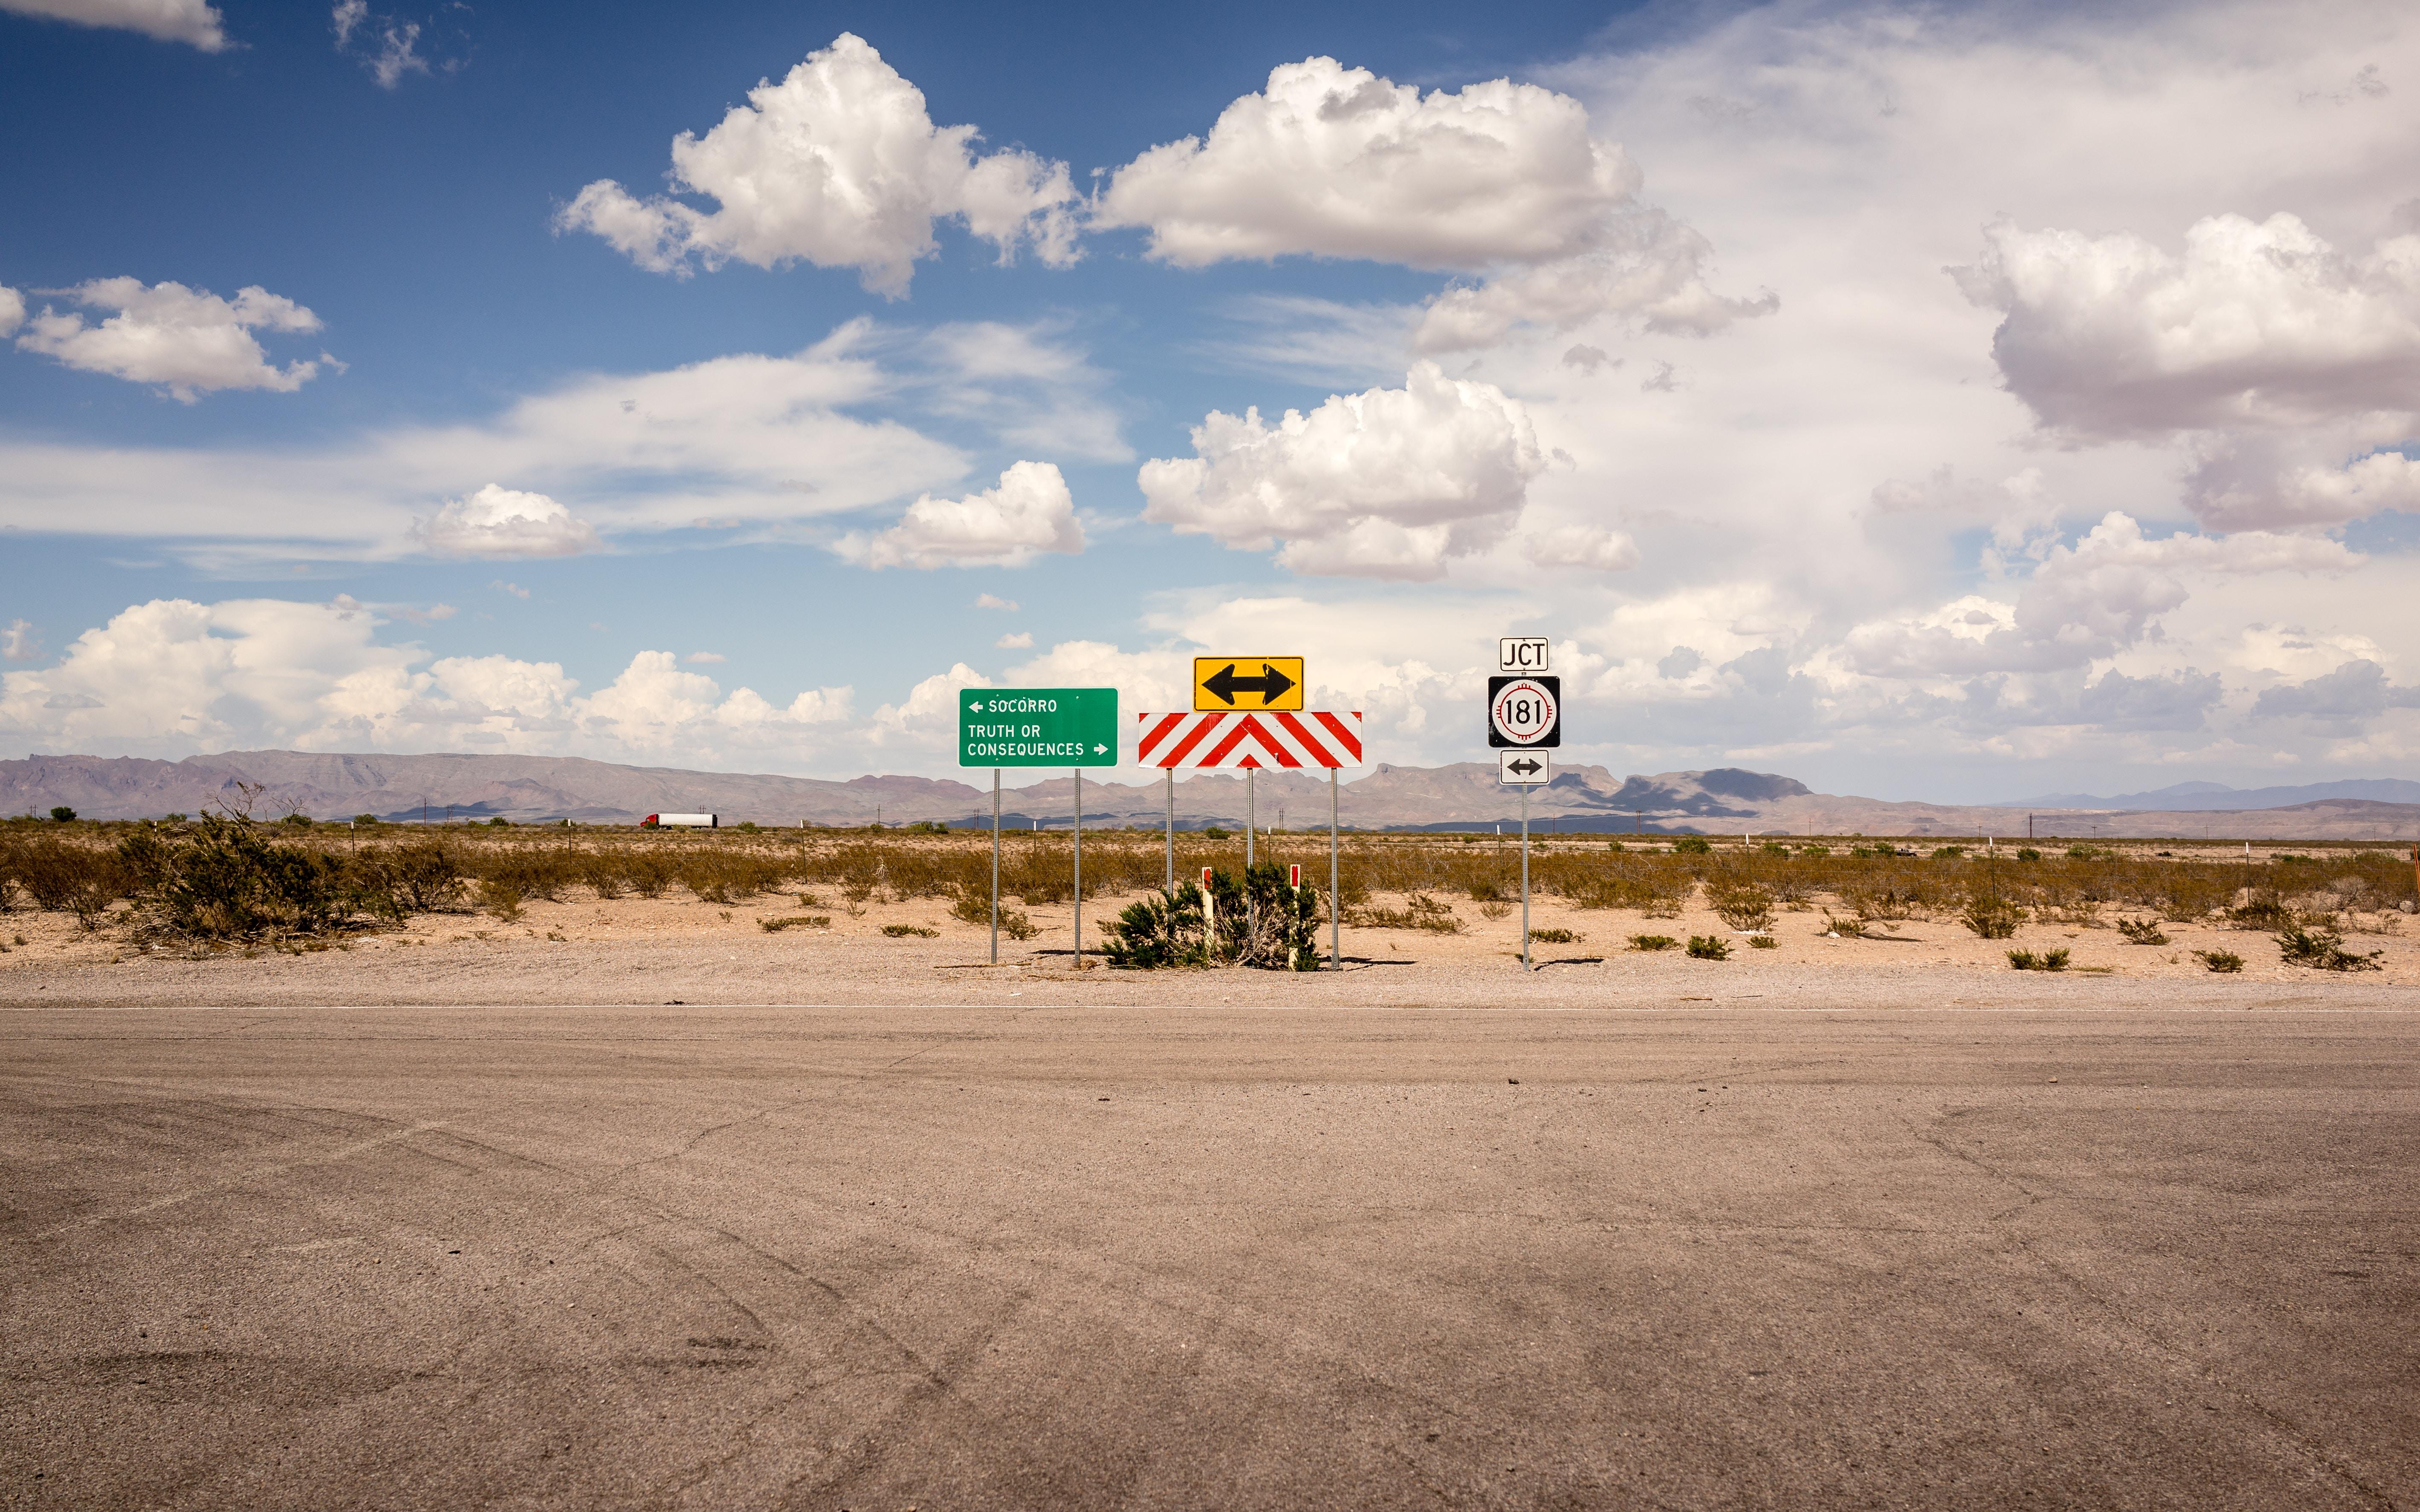 crossroads photo taken by Lachlan Donald